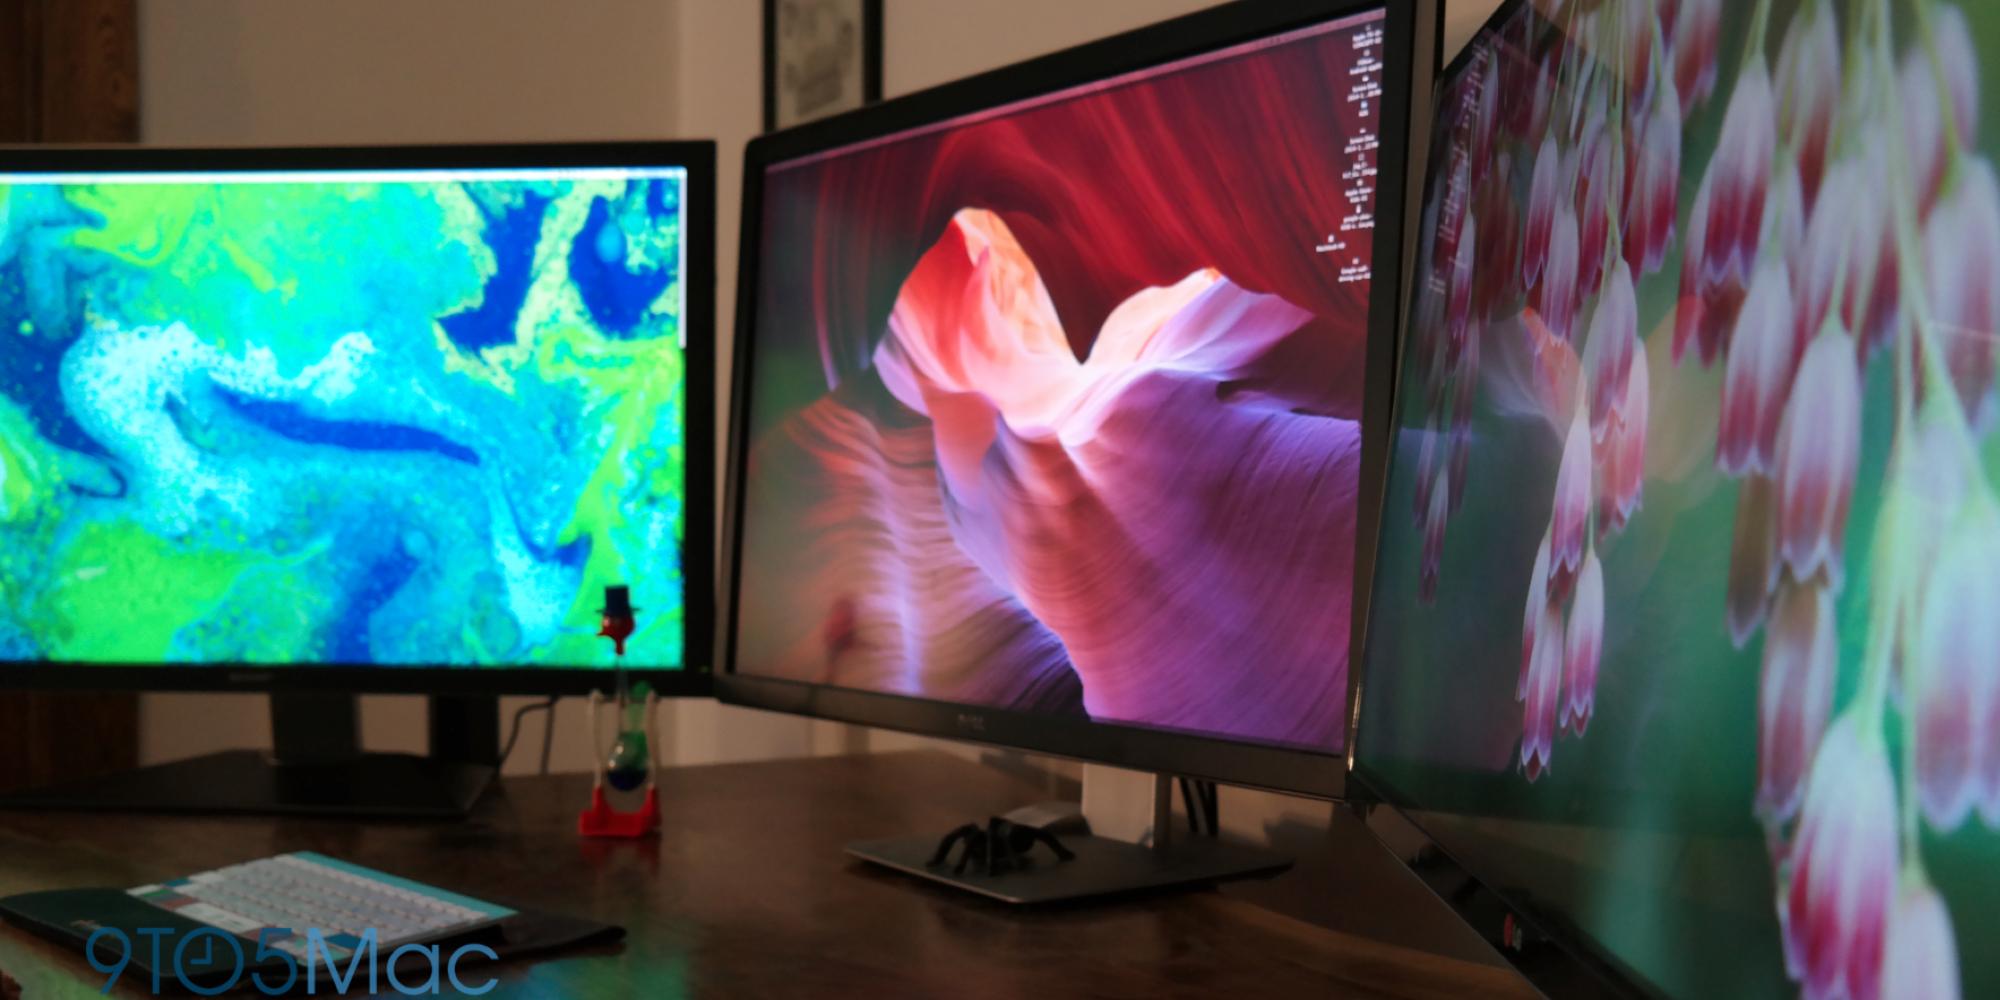 "<span href=""https://9to5mac.com/2016/07/04/apple-best-4k-5k-displays-for-mac/"">Apple Thunderbolt Display está muerto: Estos son los mejores 4K & 5K muestra para Mac</a>"